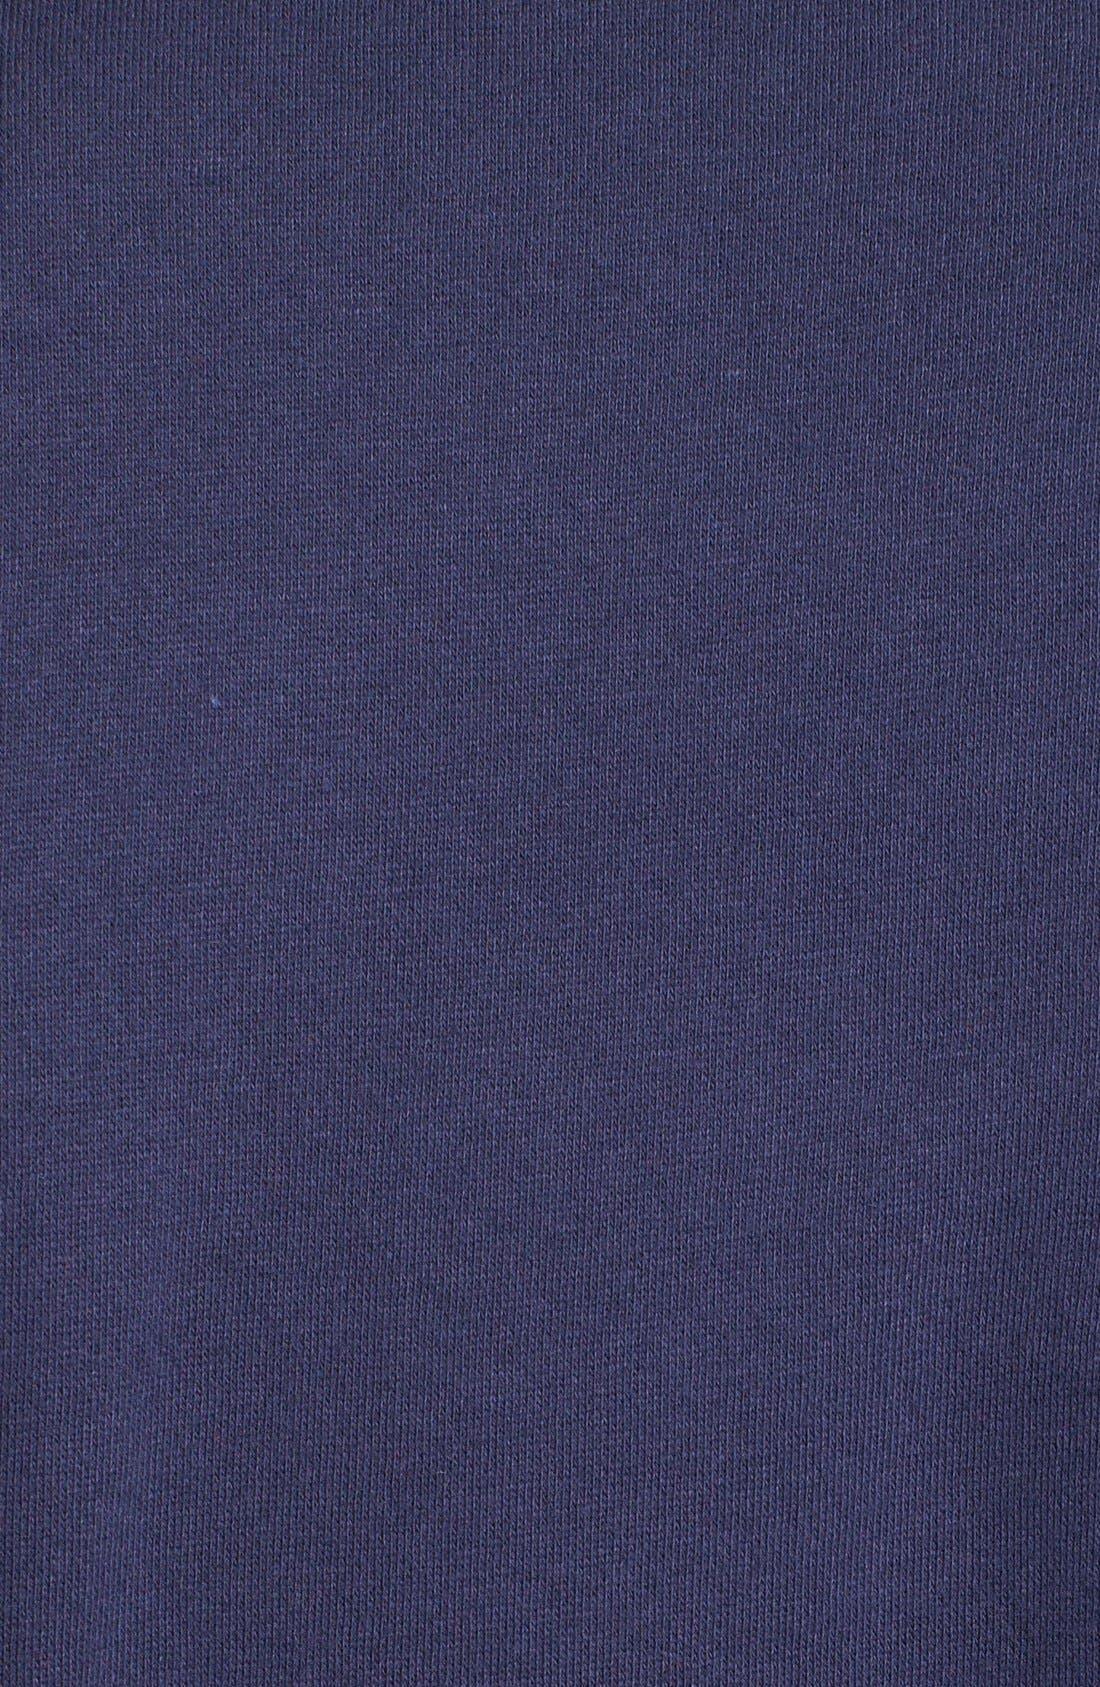 Alternate Image 3  - Mitchell & Ness 'Indiana Pacers - Technical Foul' Sweatshirt